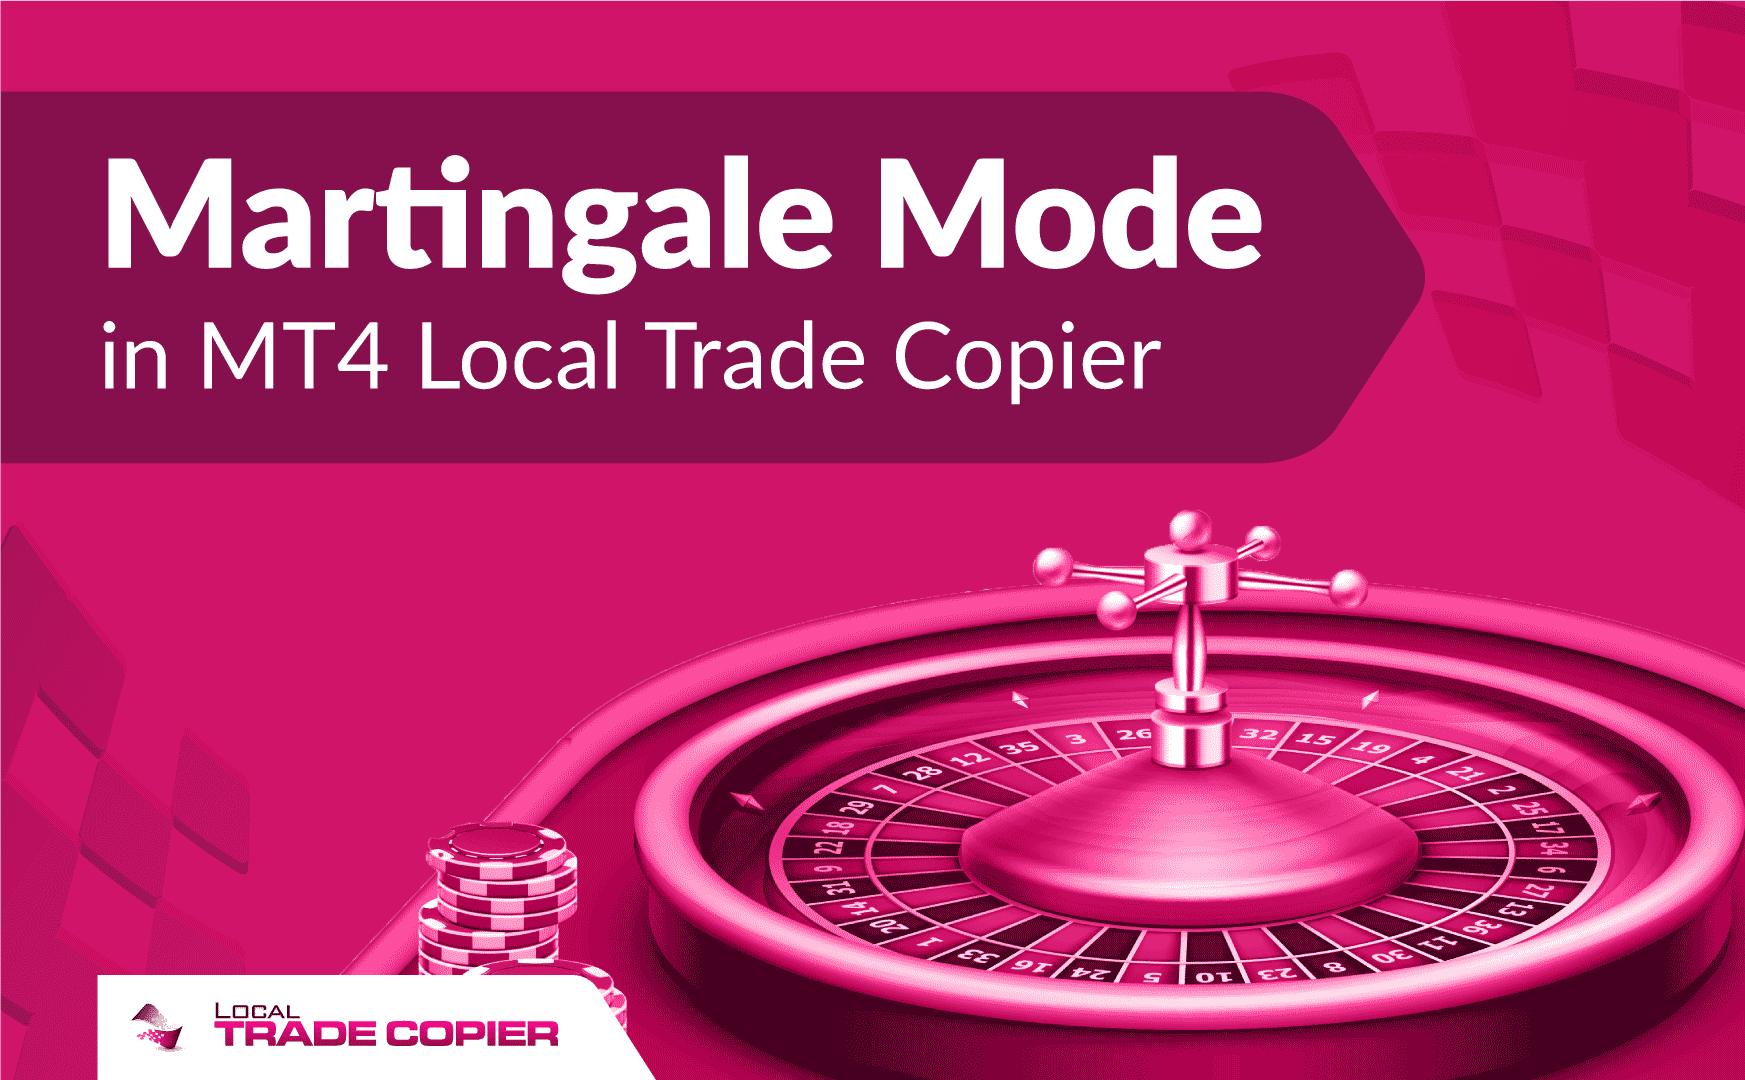 Local-Trade-Copier-Tutorials-martingale-mode-1745x1080